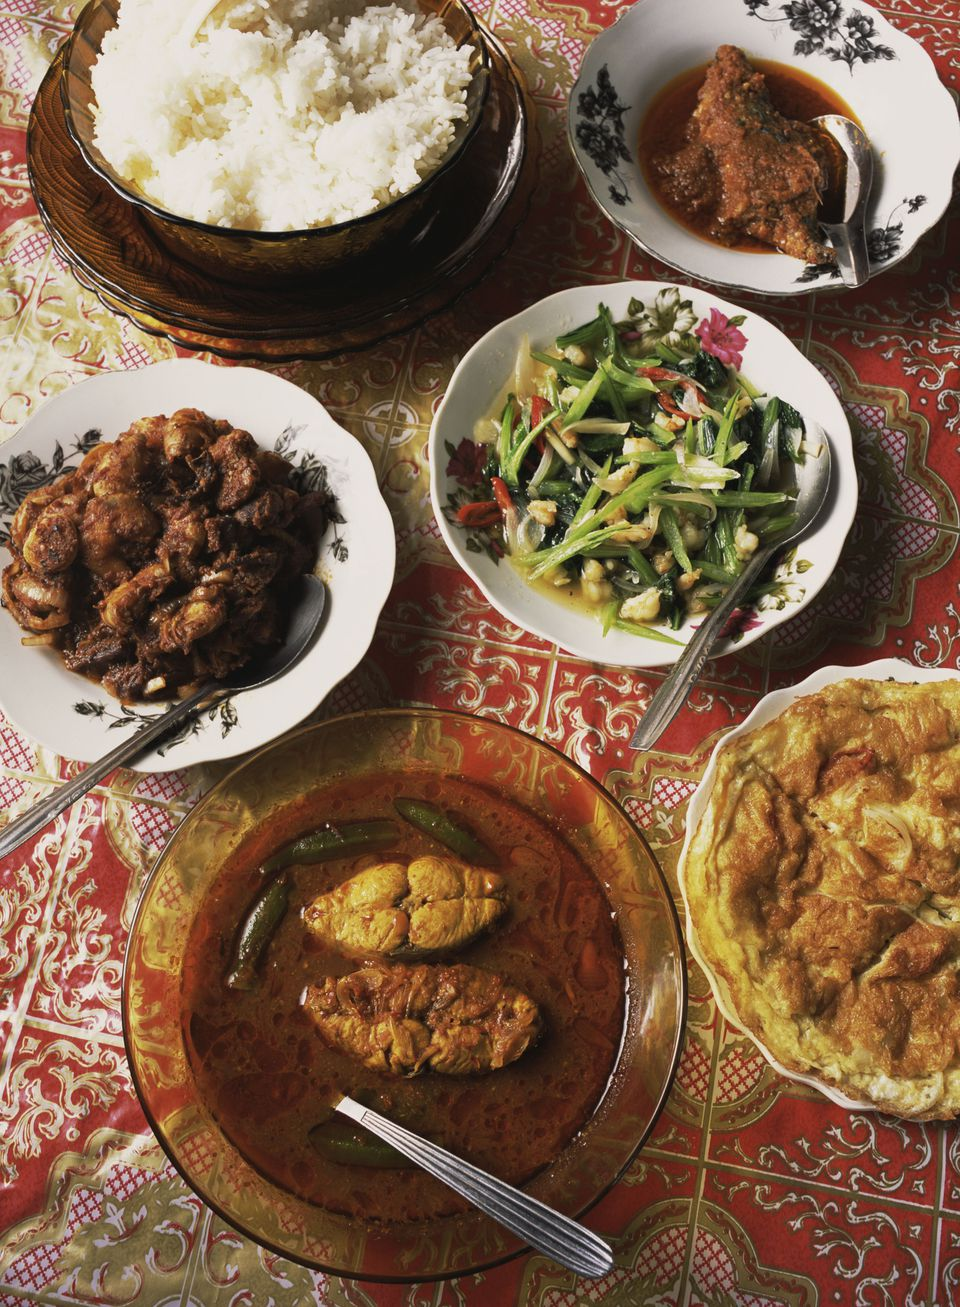 A Rijsttafel spread on a table